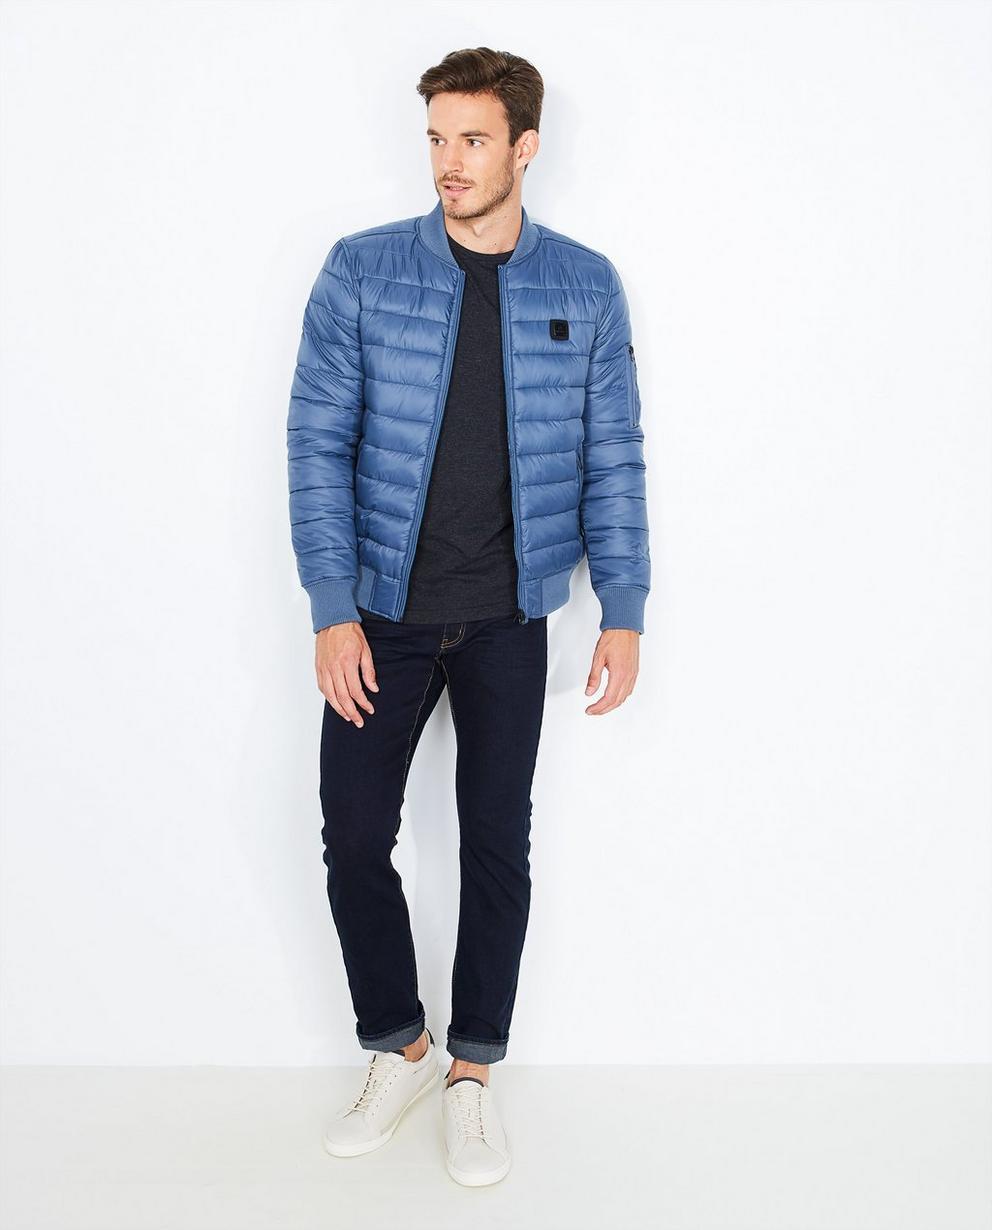 Gewatteerde gladde jas - in blauwgrijs - Quarterback